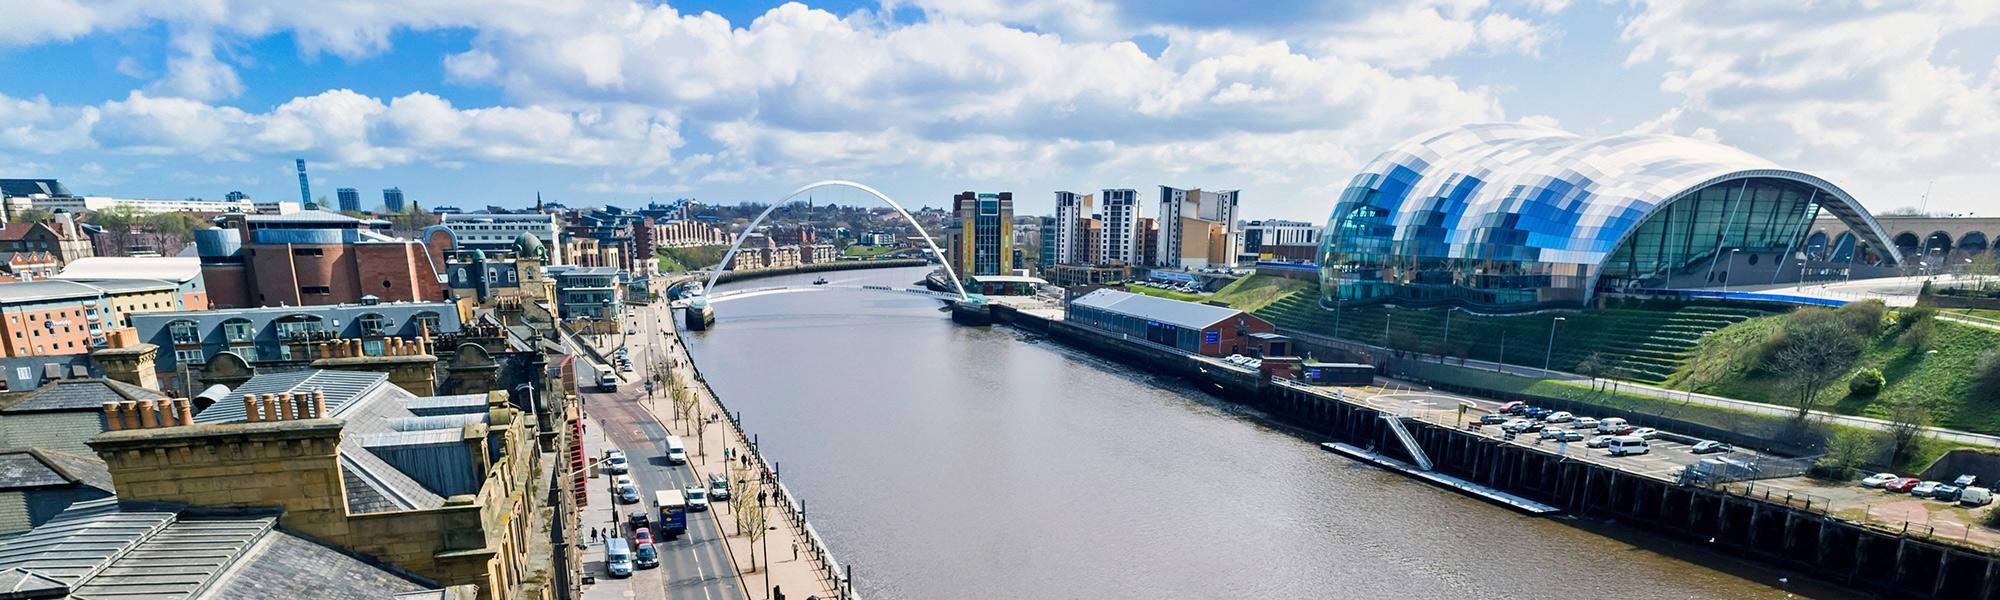 Gateshead quayside header